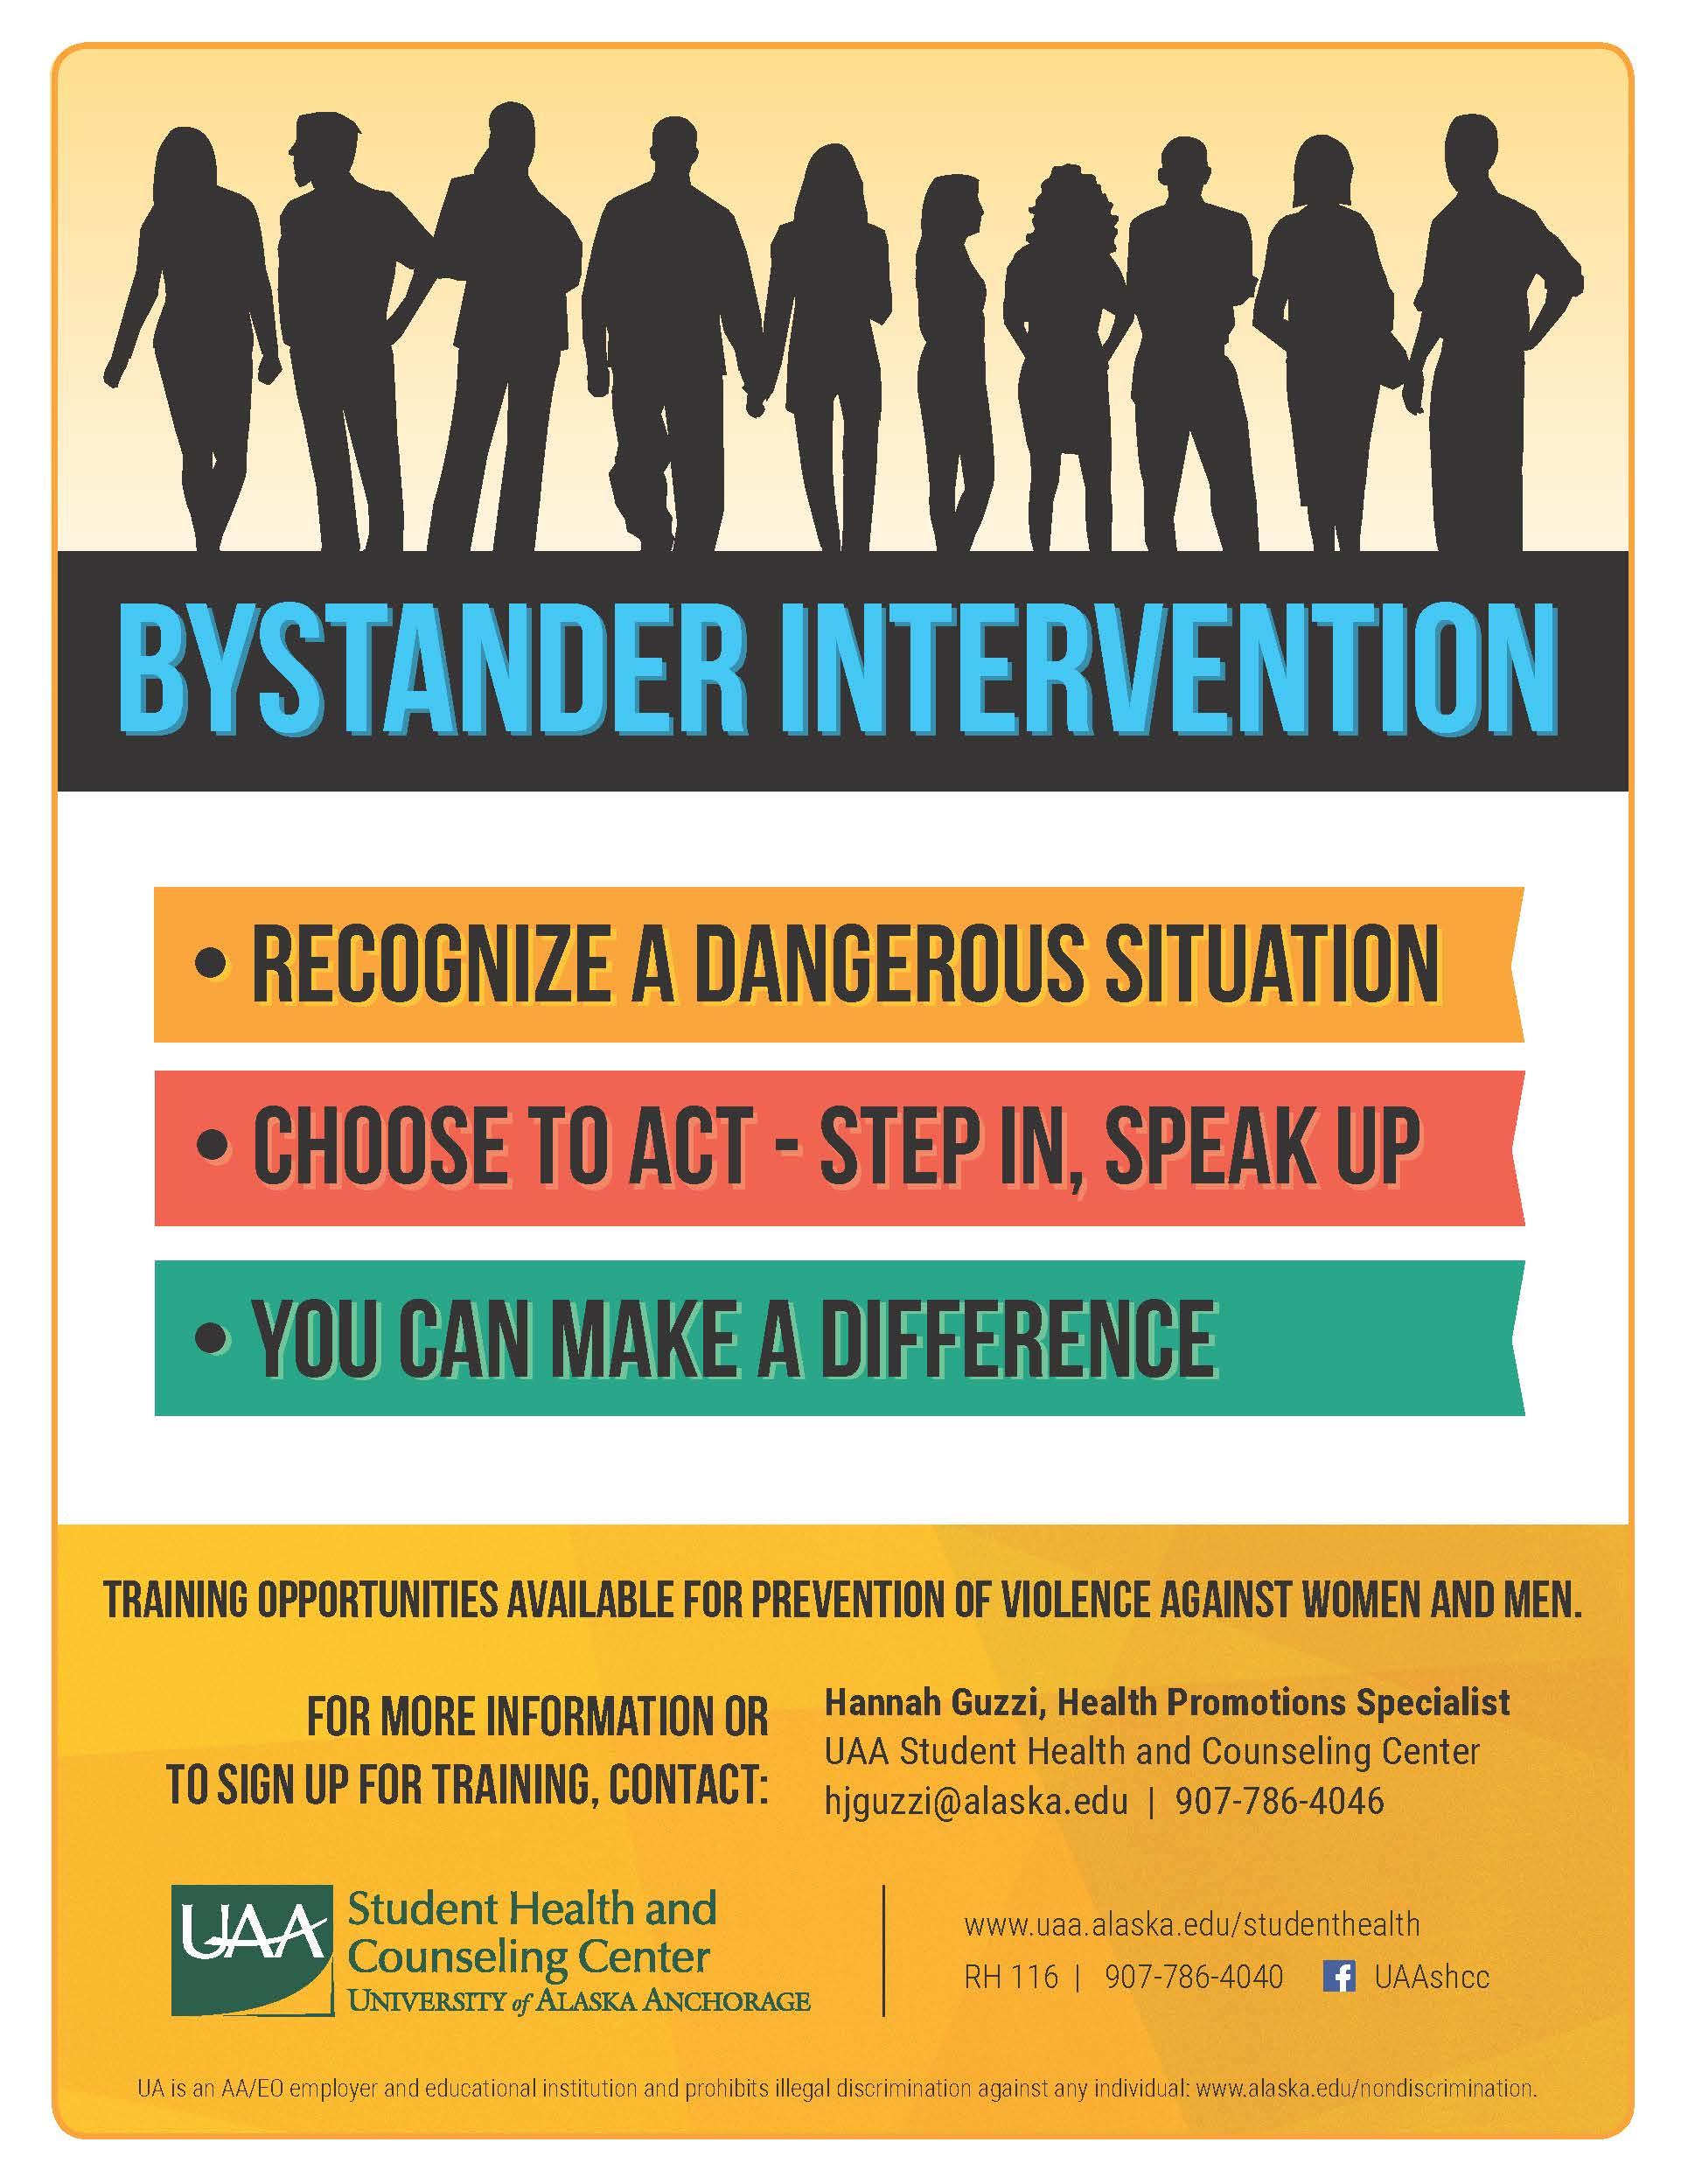 Bystander Intervention Training Contact Hannah Guzzi at 907-786-4046 or hjguzzi@alaska.edu to schedule a training.